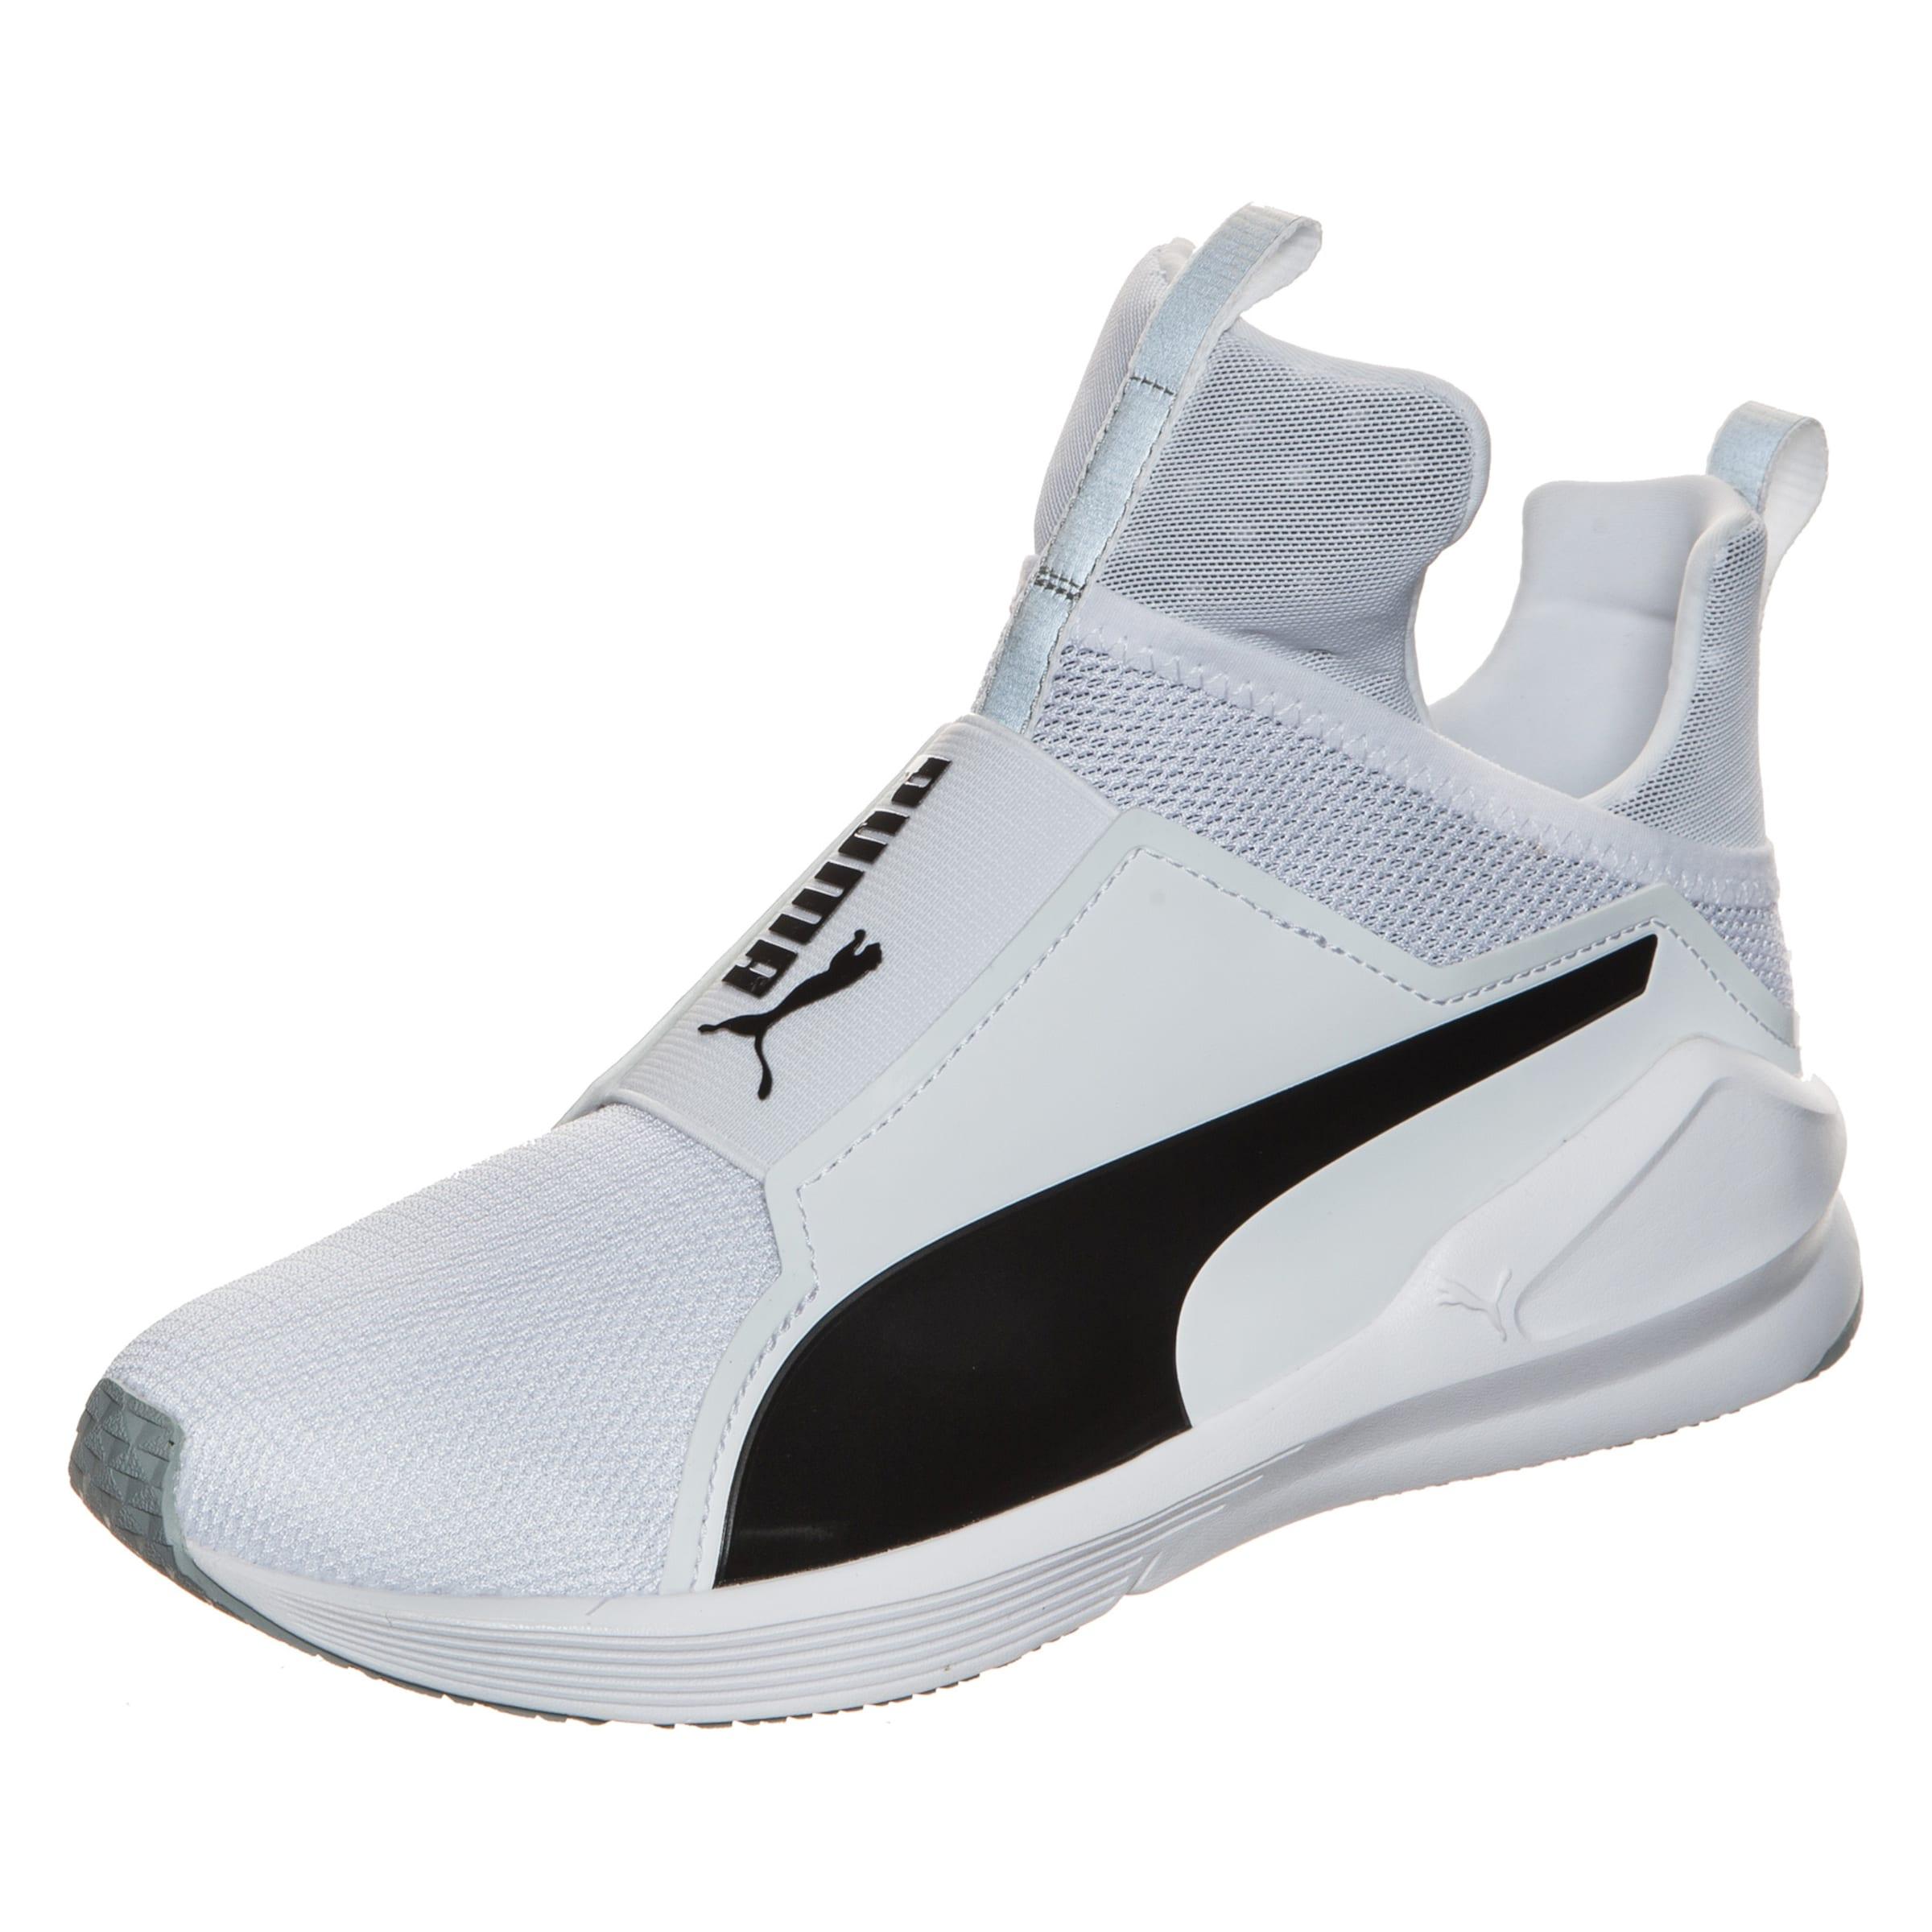 PUMA Trainingsschuh Fierce Core Verschleißfeste Schuhe billige Schuhe Verschleißfeste 574e5e